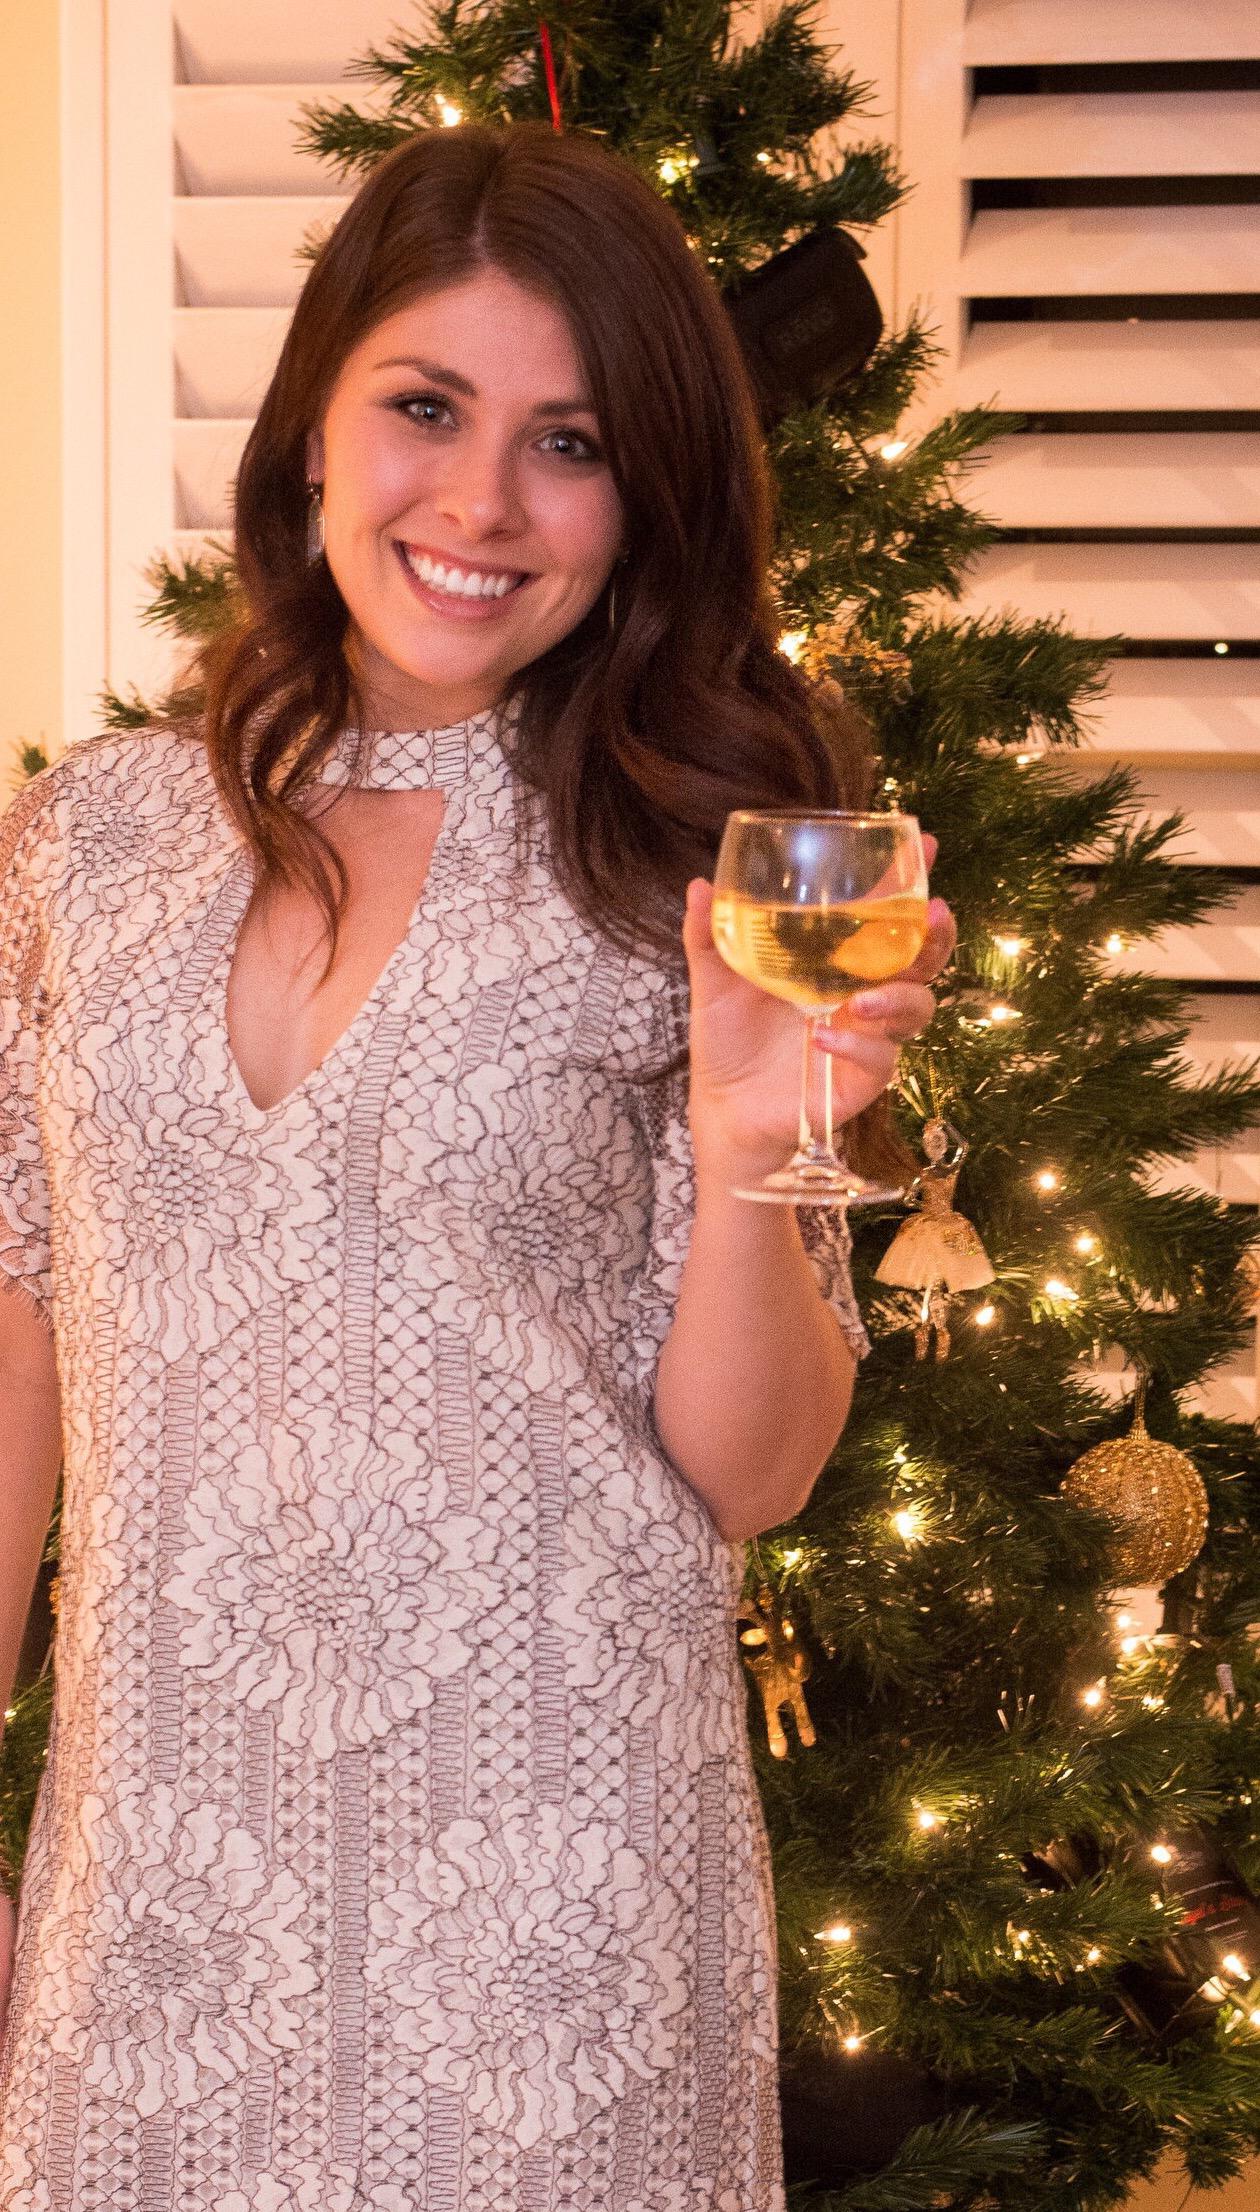 lace-holiday-dress.JPG